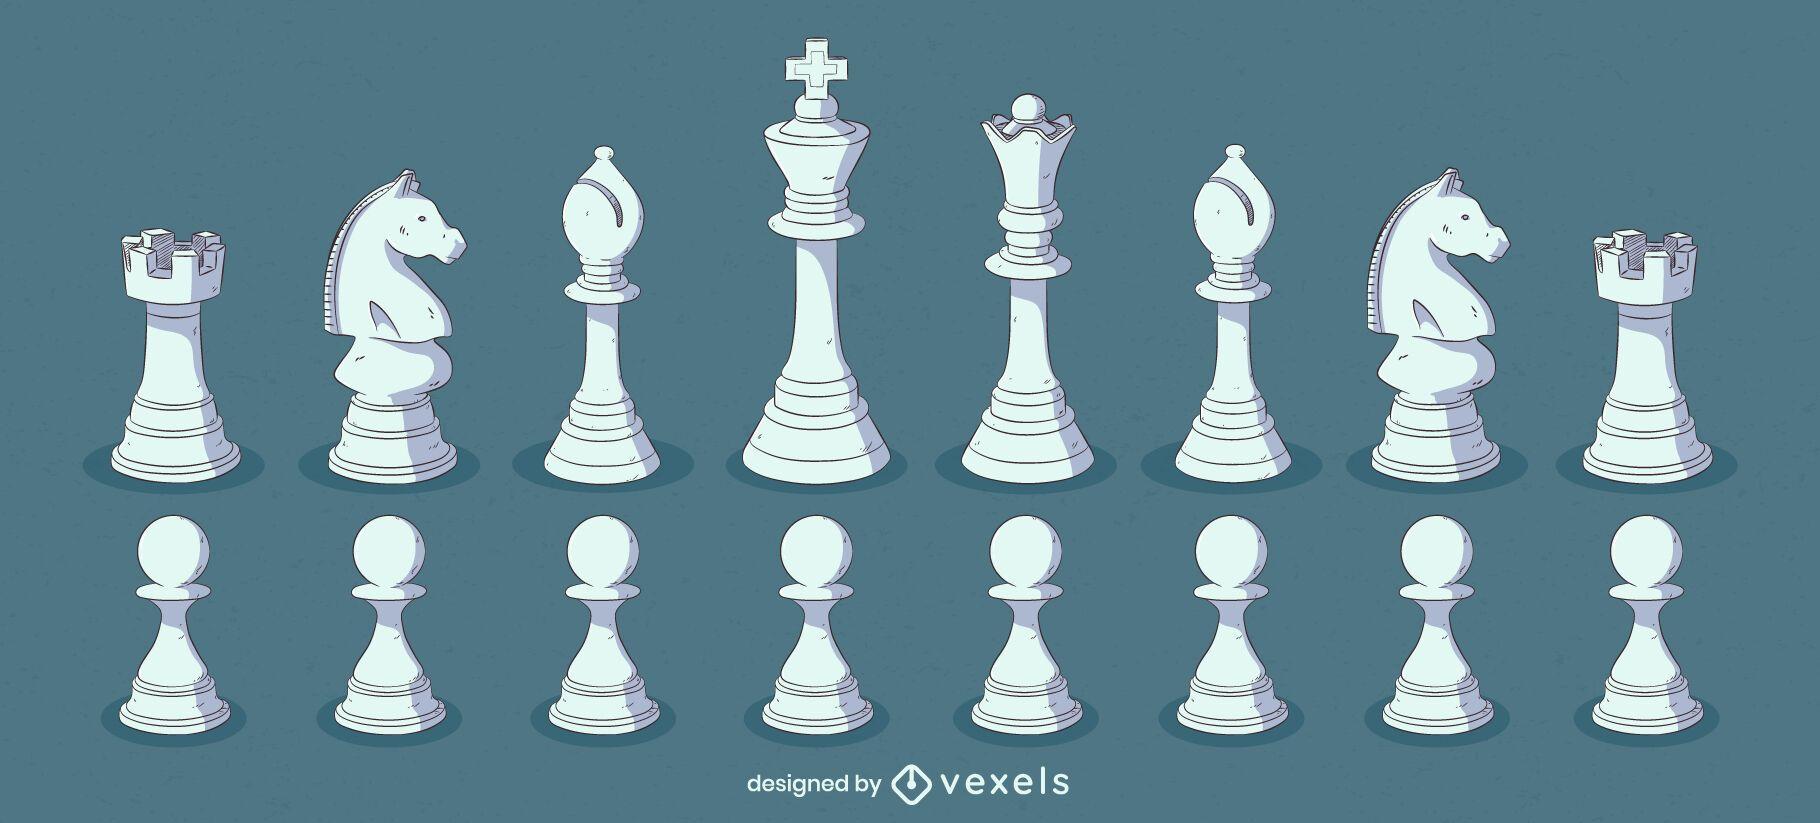 White chess pieces color illustration set